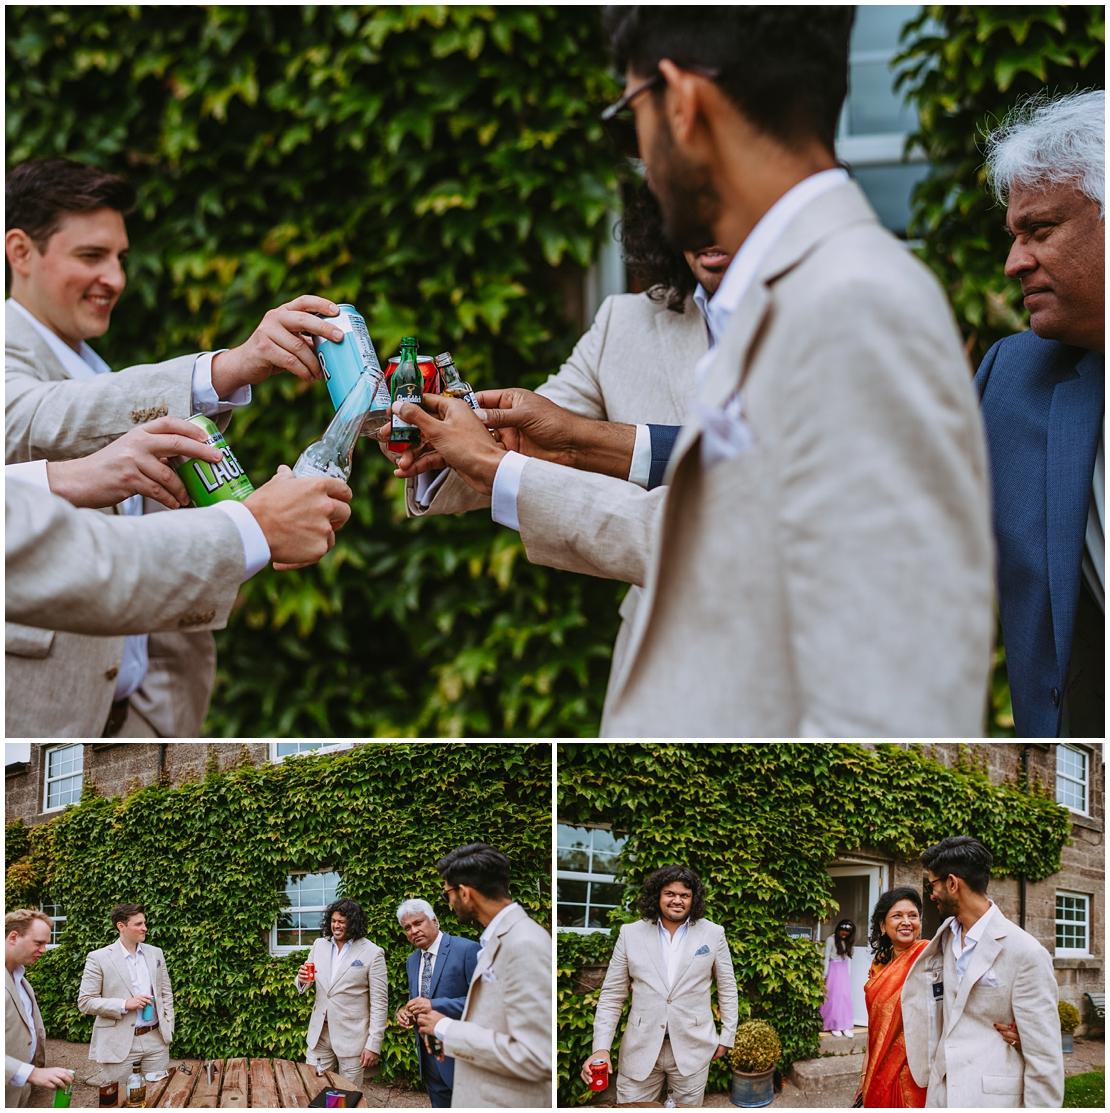 doxford barns wedding photography katie vivek 0003